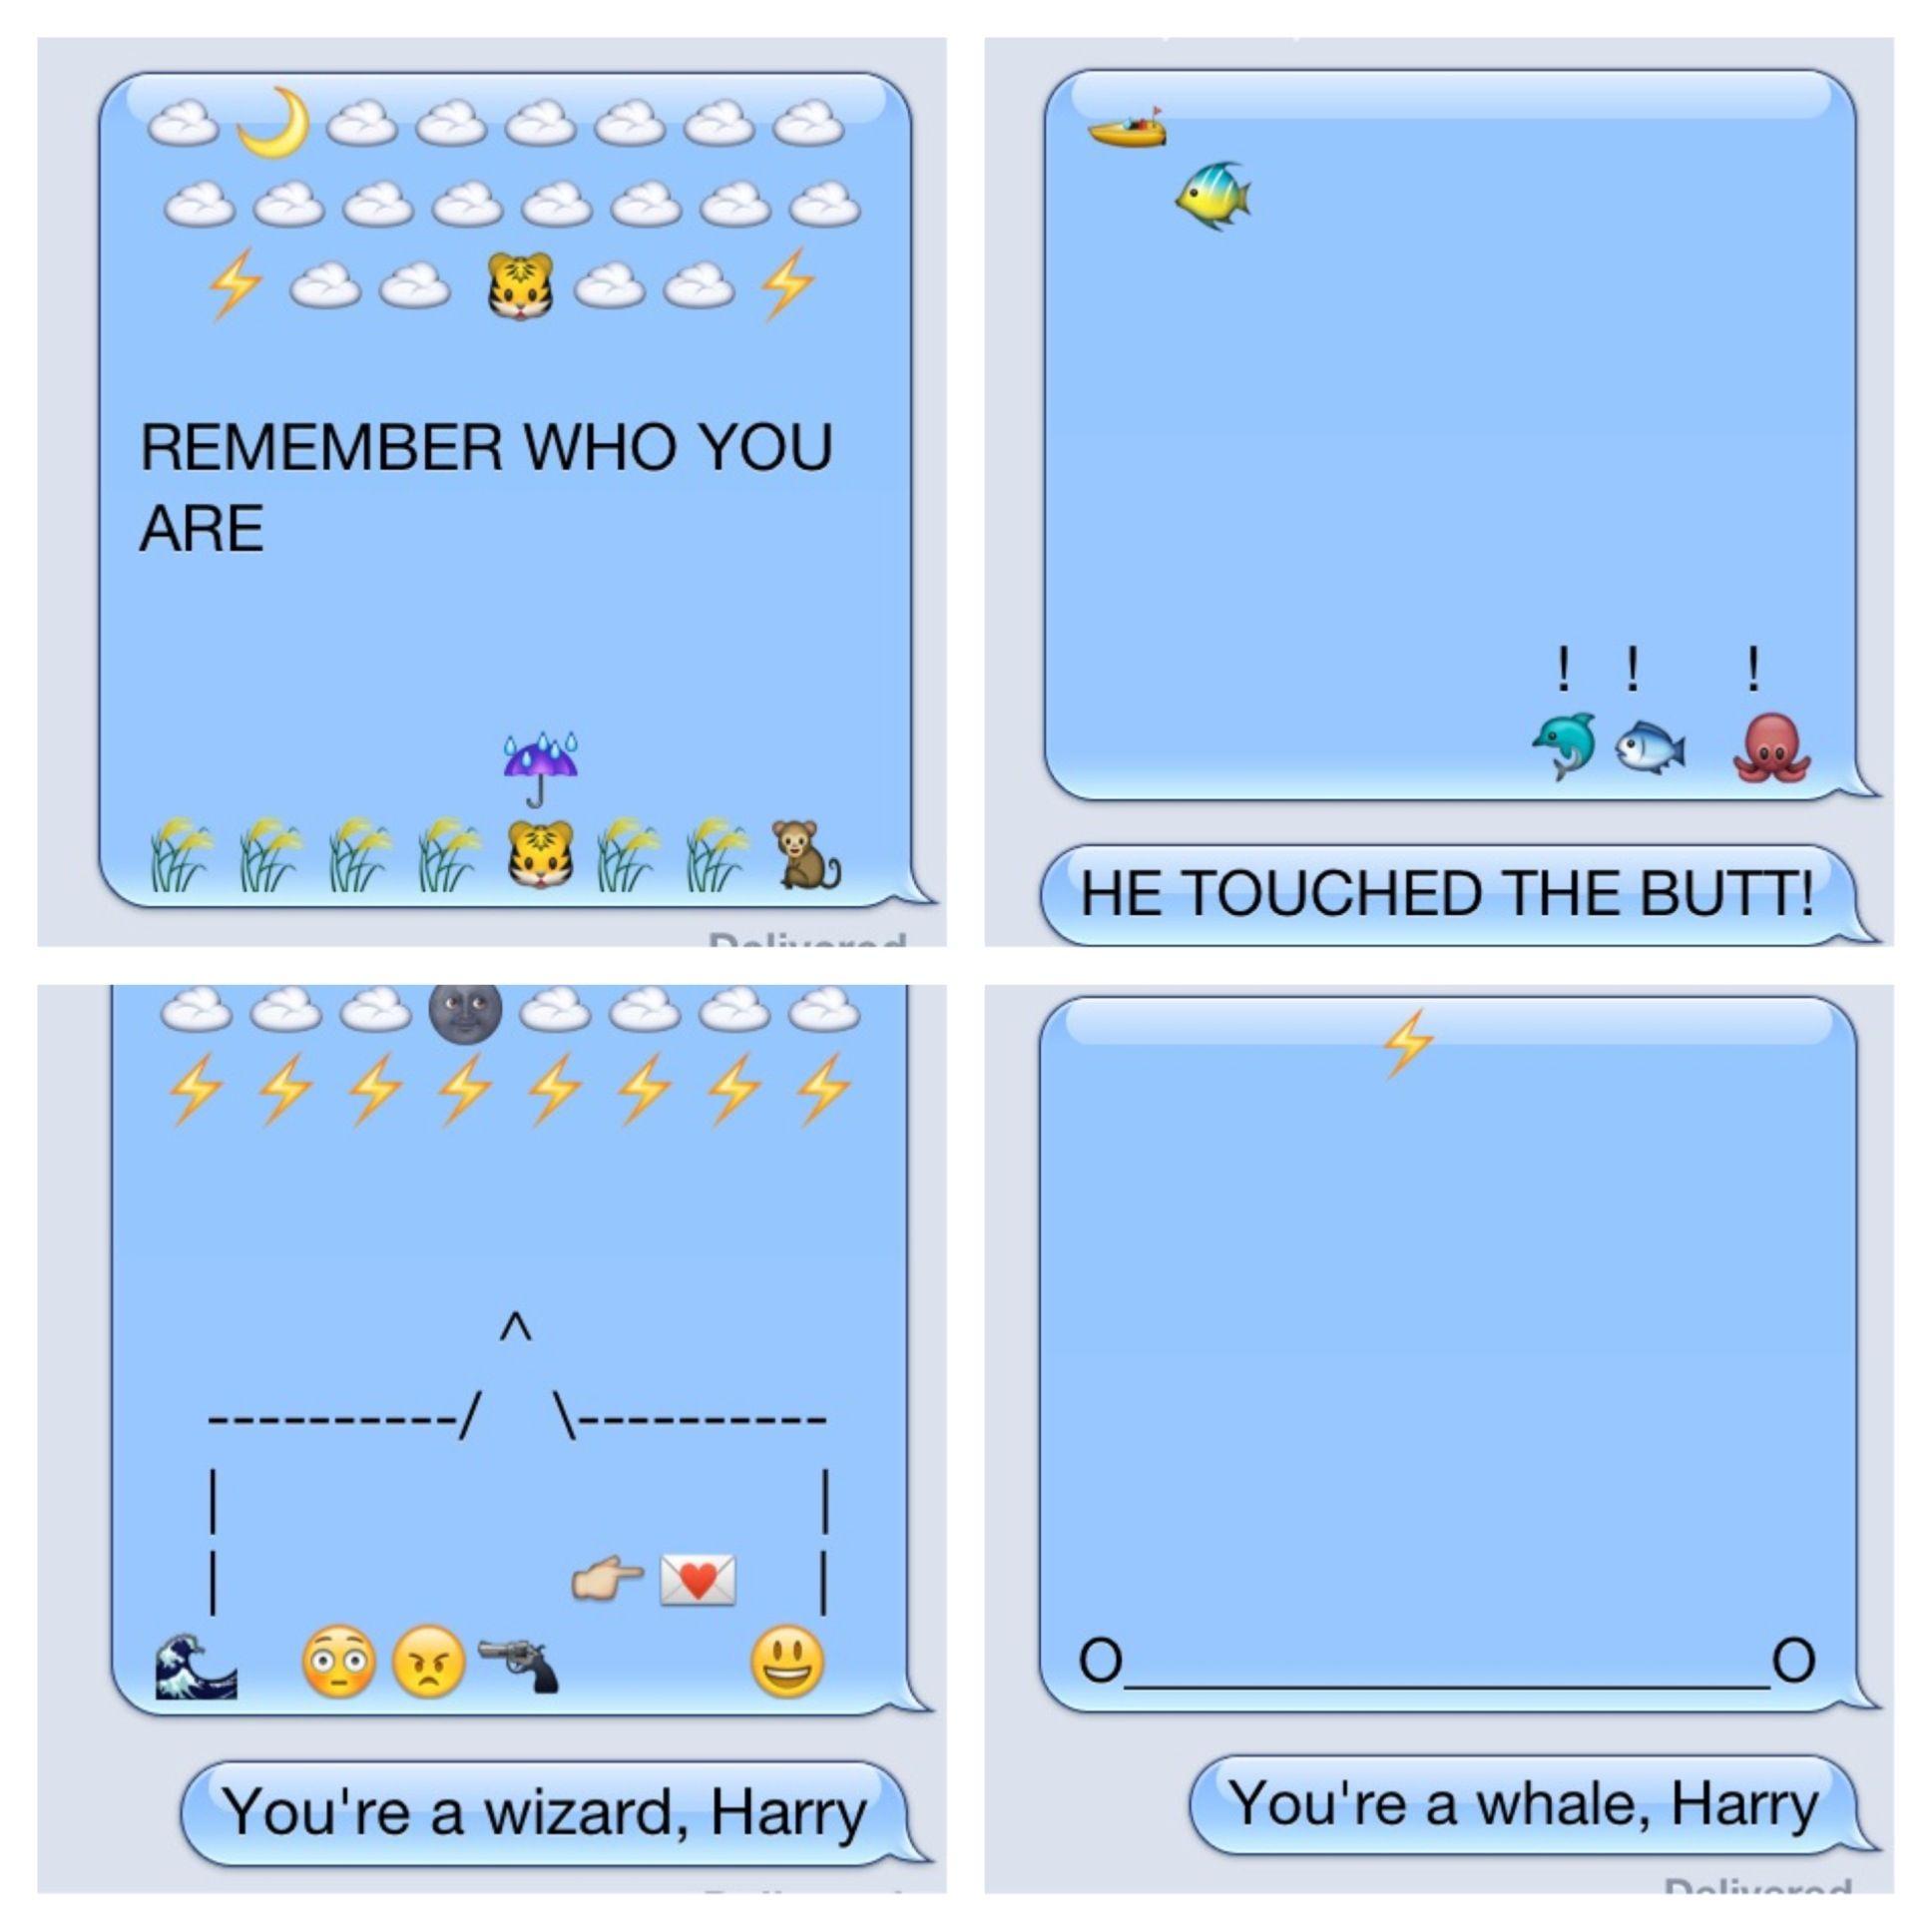 12f68da71ed58e712e8108f6879bf821 just having fun with emoji! emoji messages funny texts texts